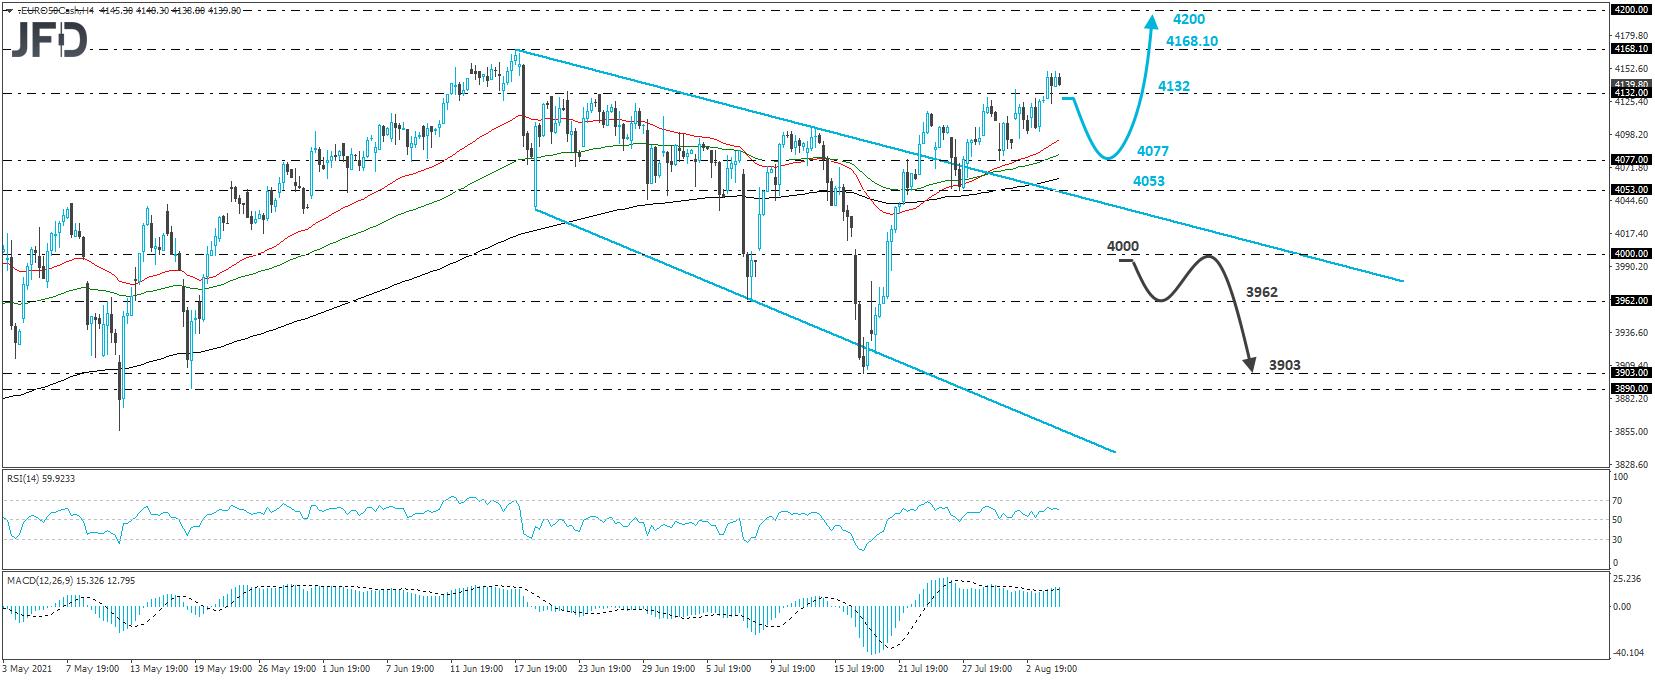 Euro Stoxx cash index 4-hour chart technical analysis